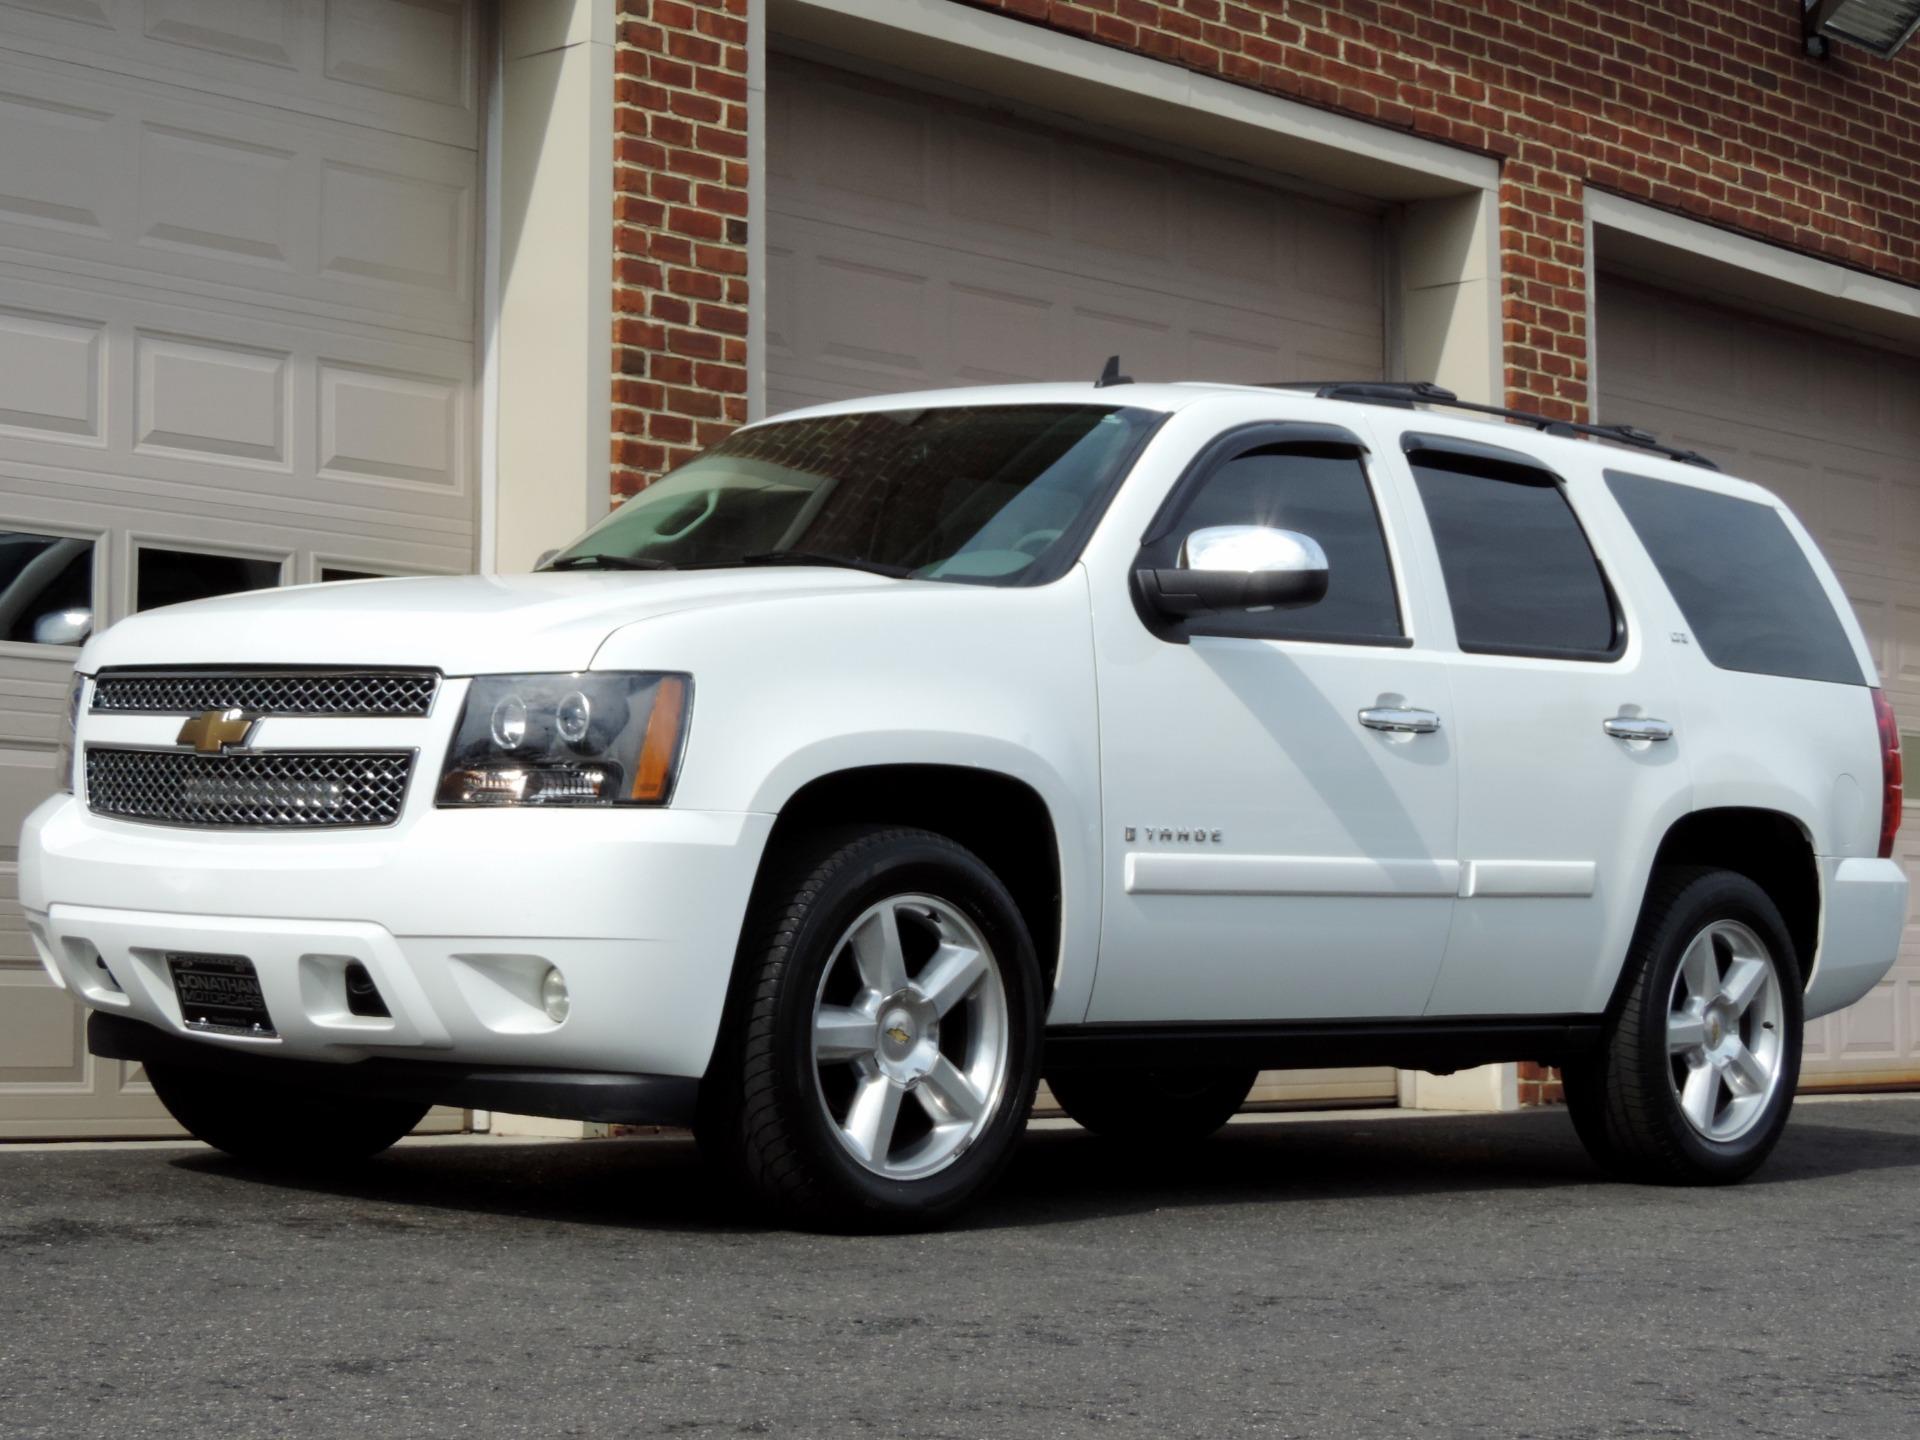 2007 Chevrolet Tahoe Ltz >> 2007 Chevrolet Tahoe Ltz Stock 387144 For Sale Near Edgewater Park